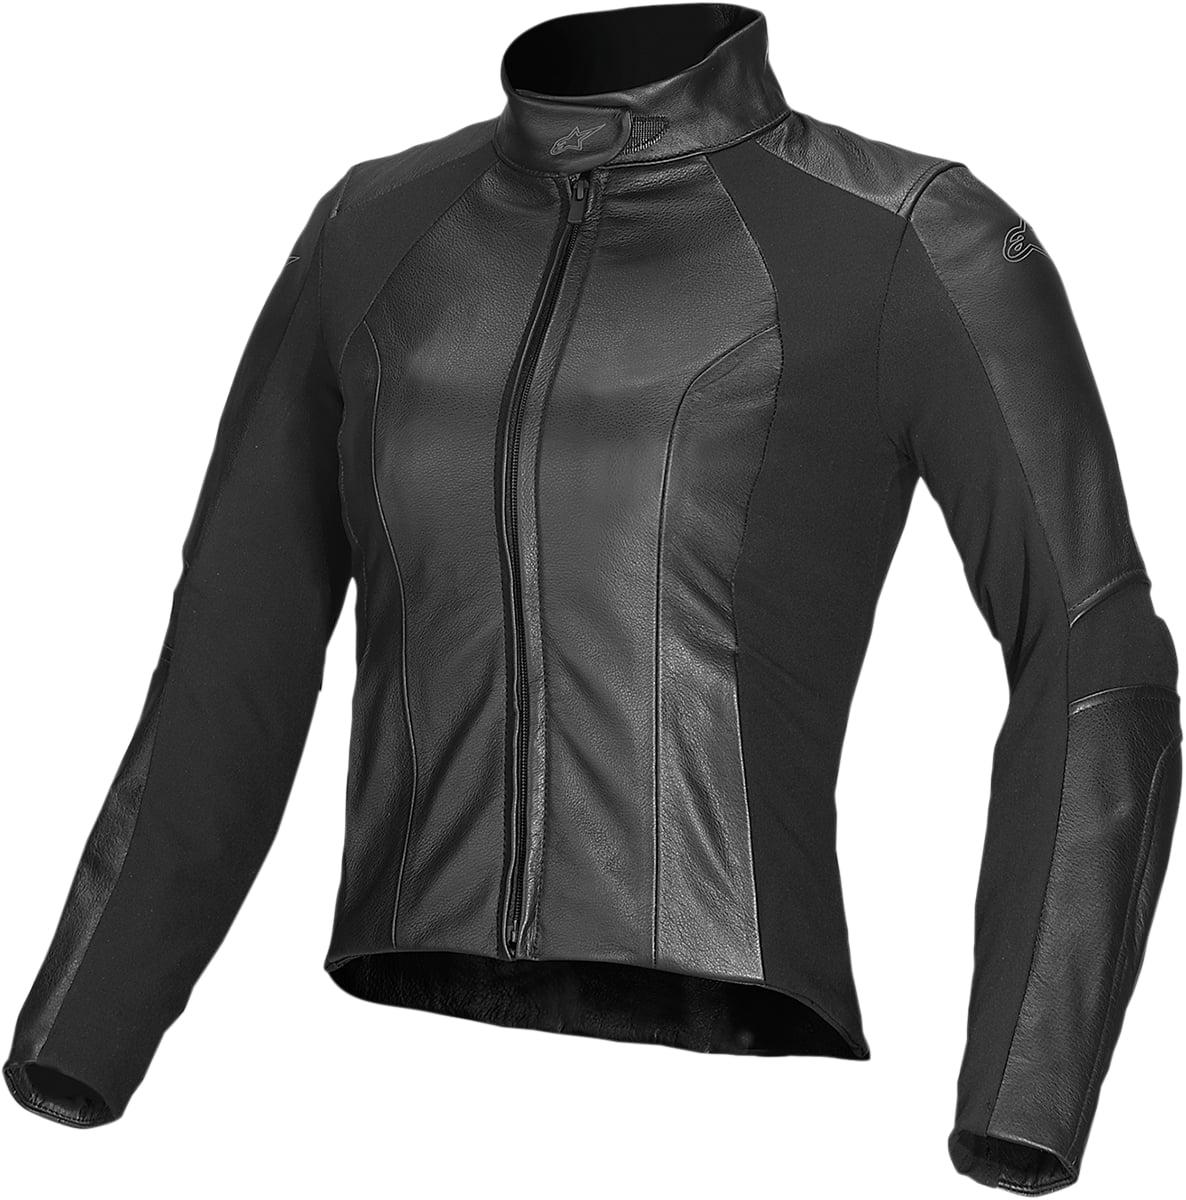 Alpinestars Vika 2X-Large Black Leather Jacket 14 50